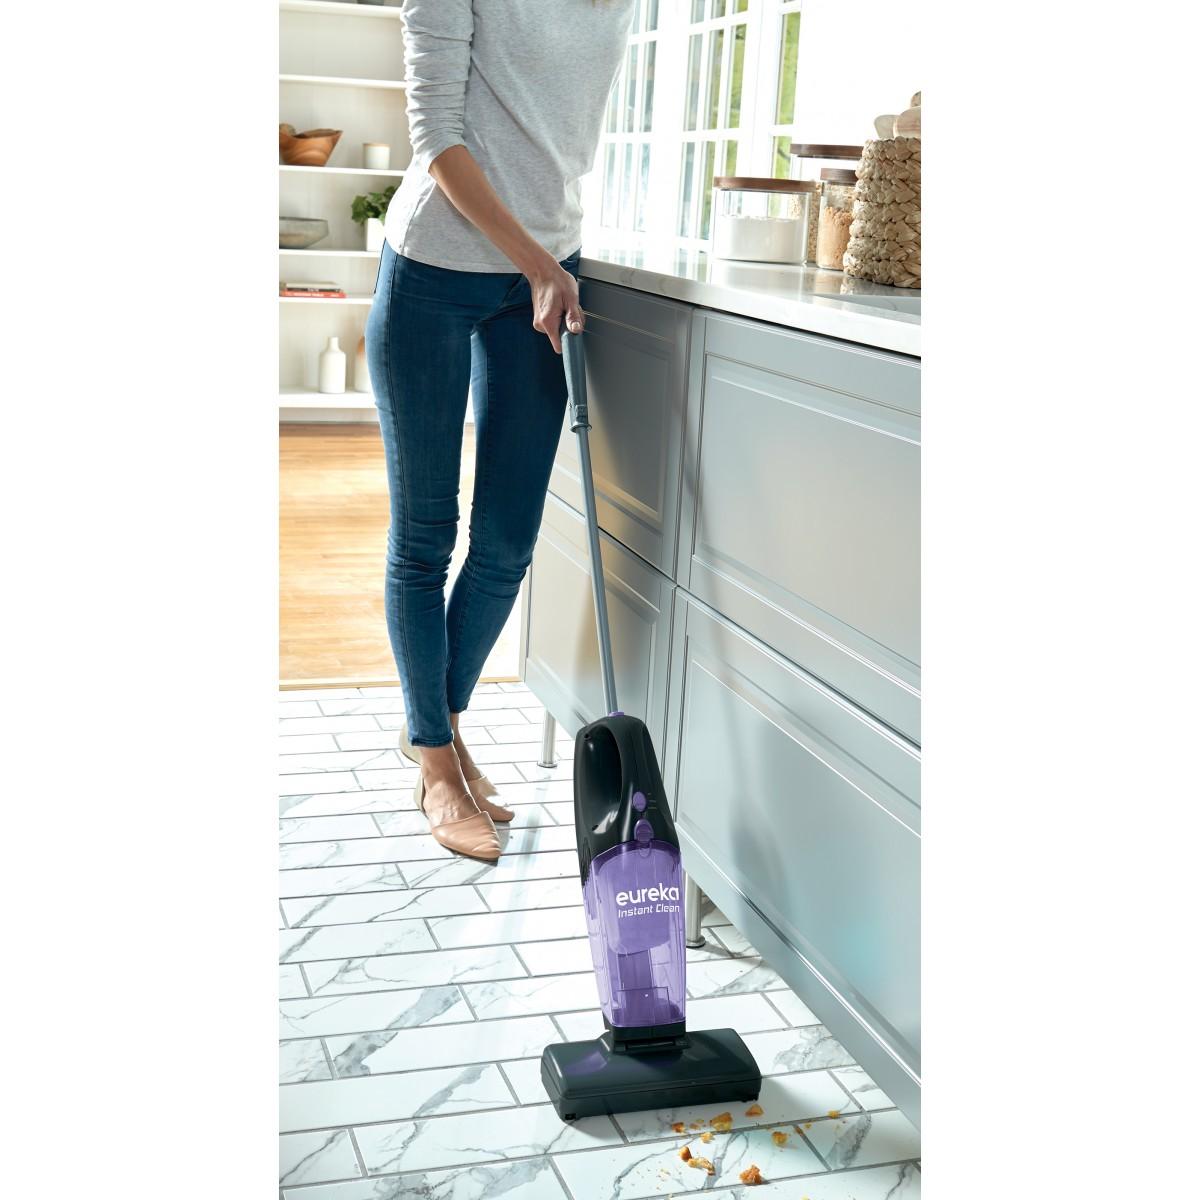 Cordless Vacuum Eureka Instant Clean Transformable